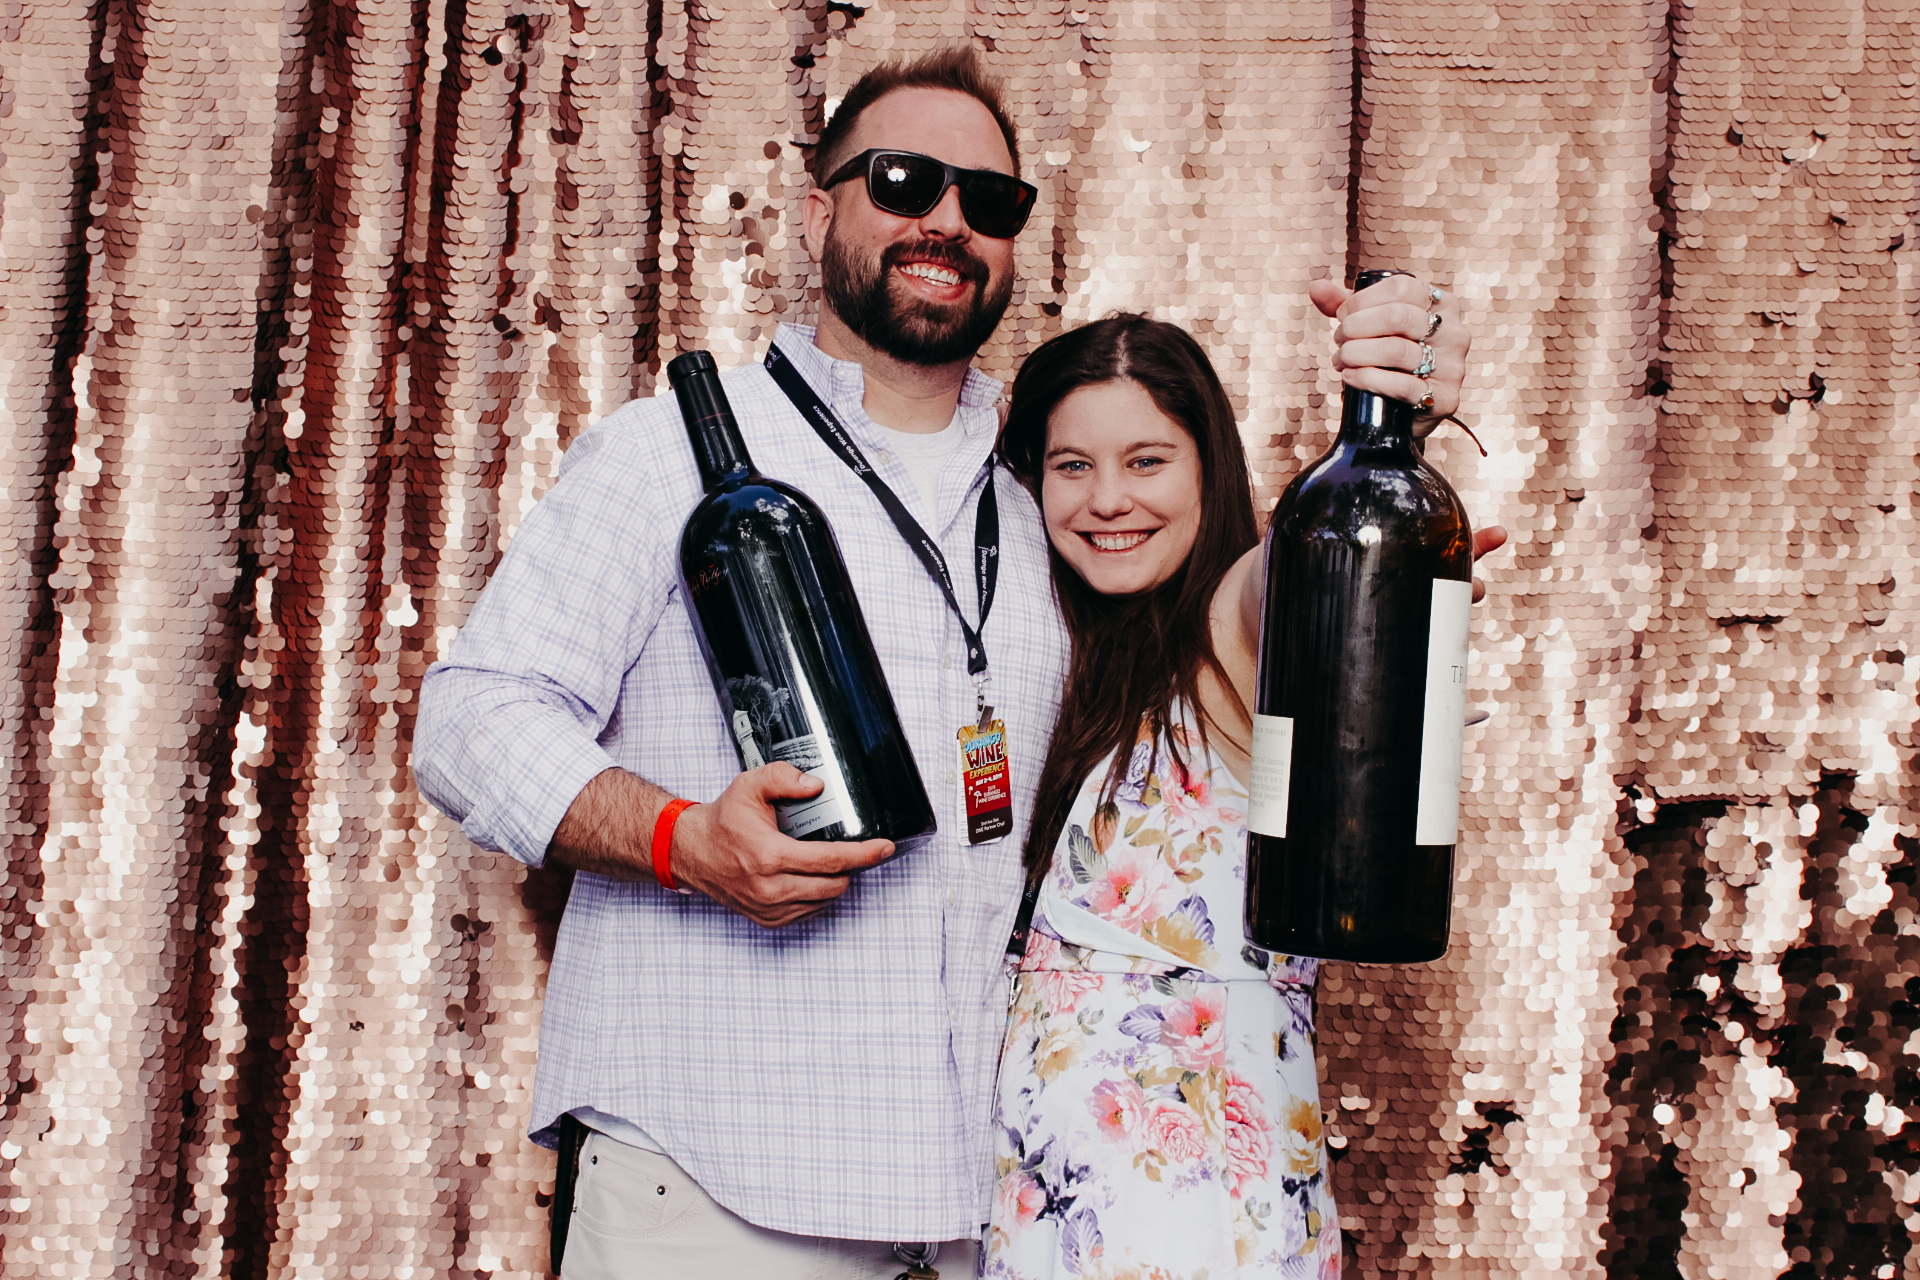 Durango+PhotoBooth+Durango+Wine+Experience-100.jpg